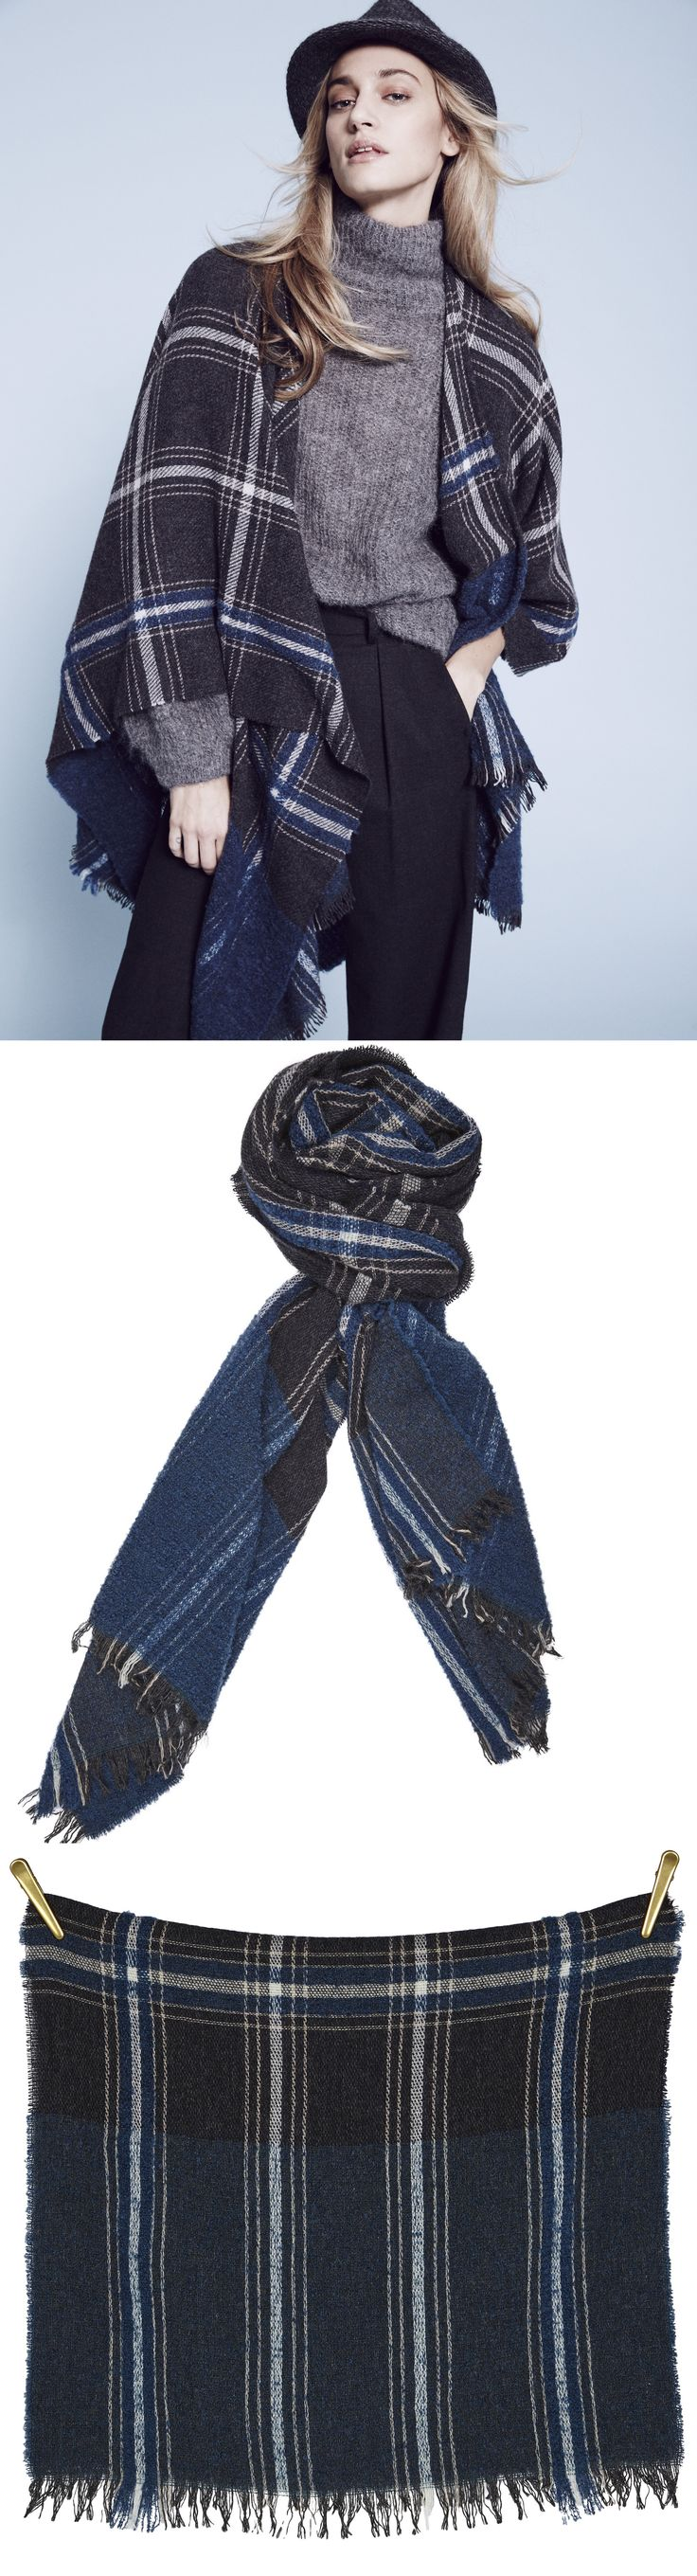 CHECK IT OUT BellaBallou woven scarf | Blue/Grey size 58x200 cm wool modal polamide #aw16 #fashion #poncho feel #blue